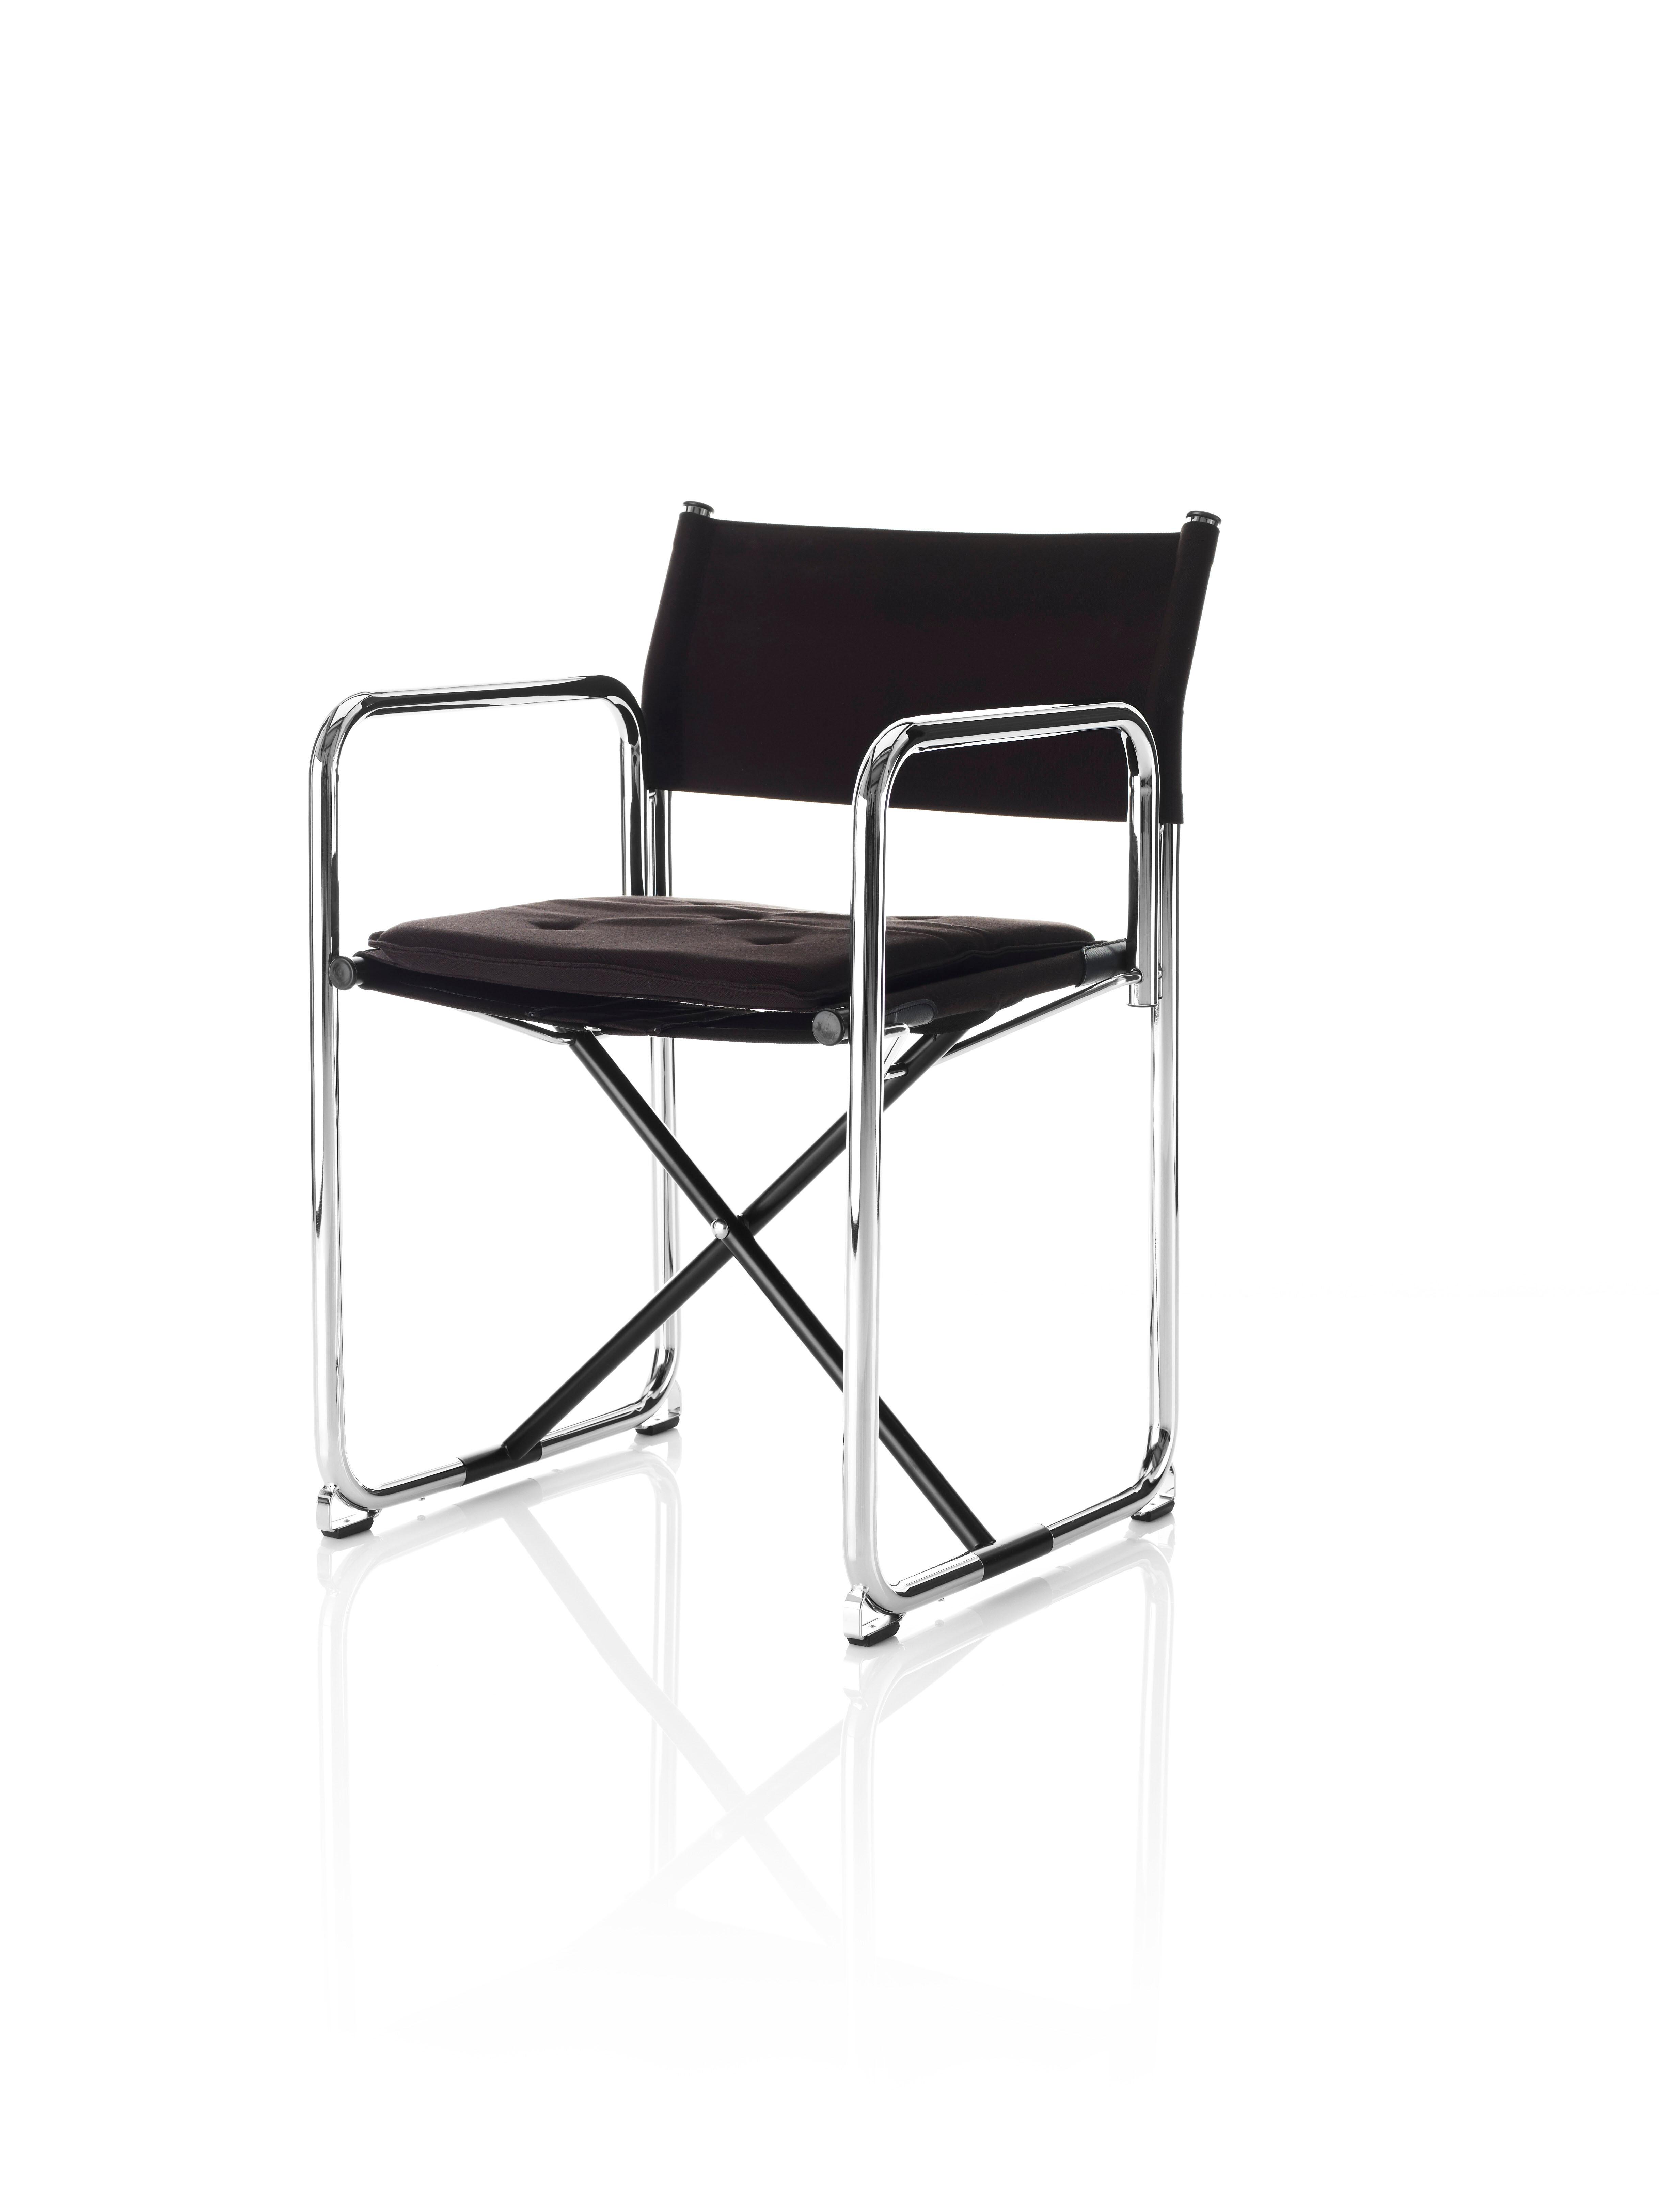 X75 2 Chairs & Armchairs